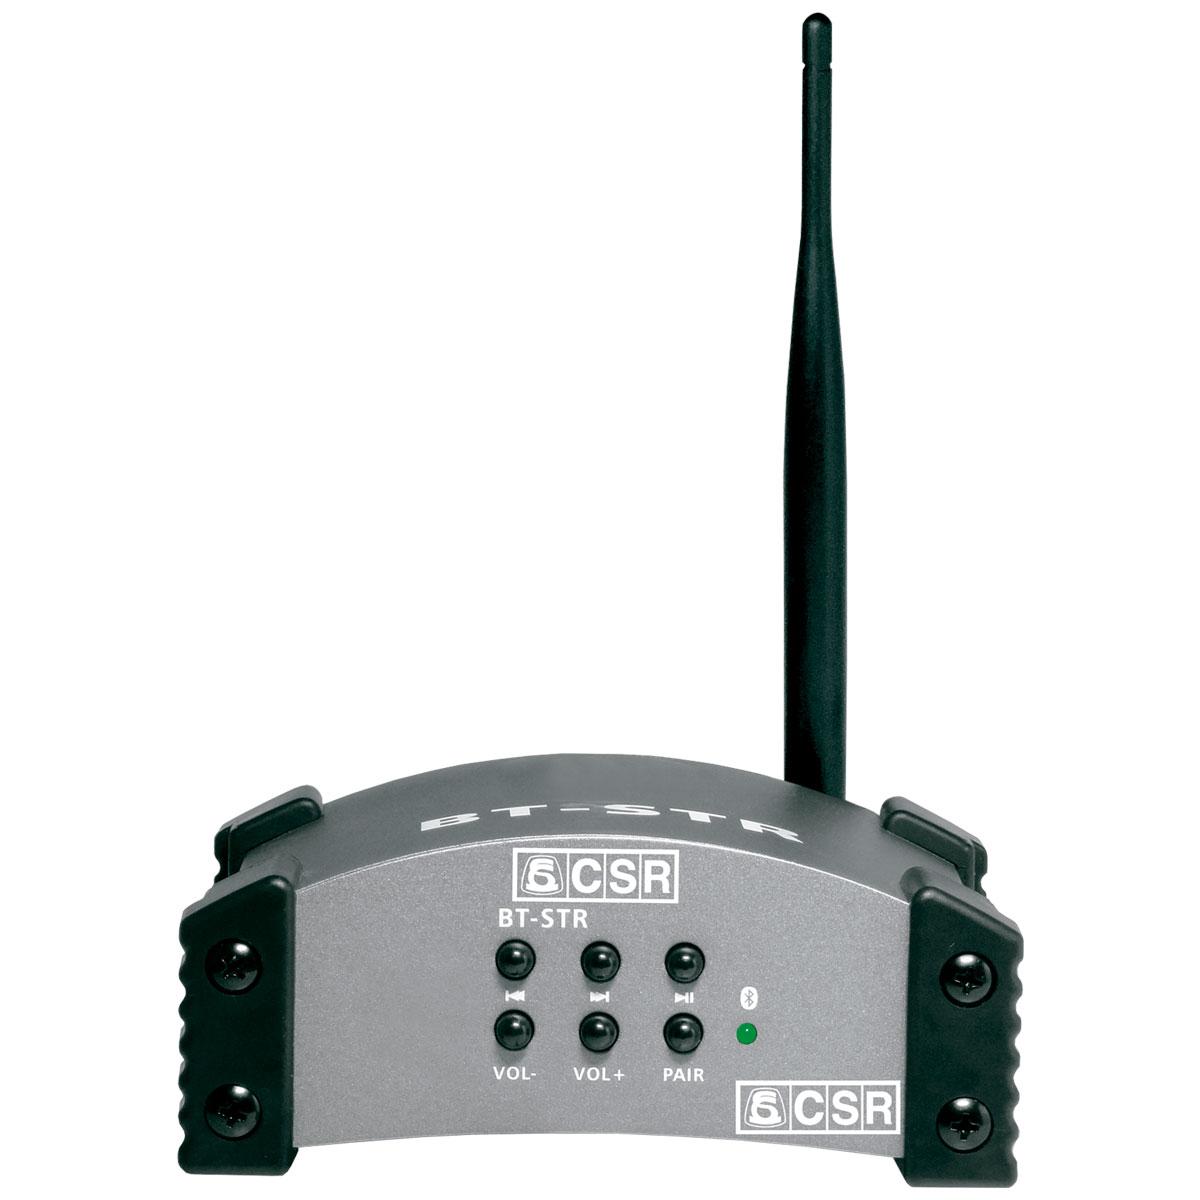 BTSTR - Receptor de �udio c/ Bluetooth Est�reo BT STR - CSR